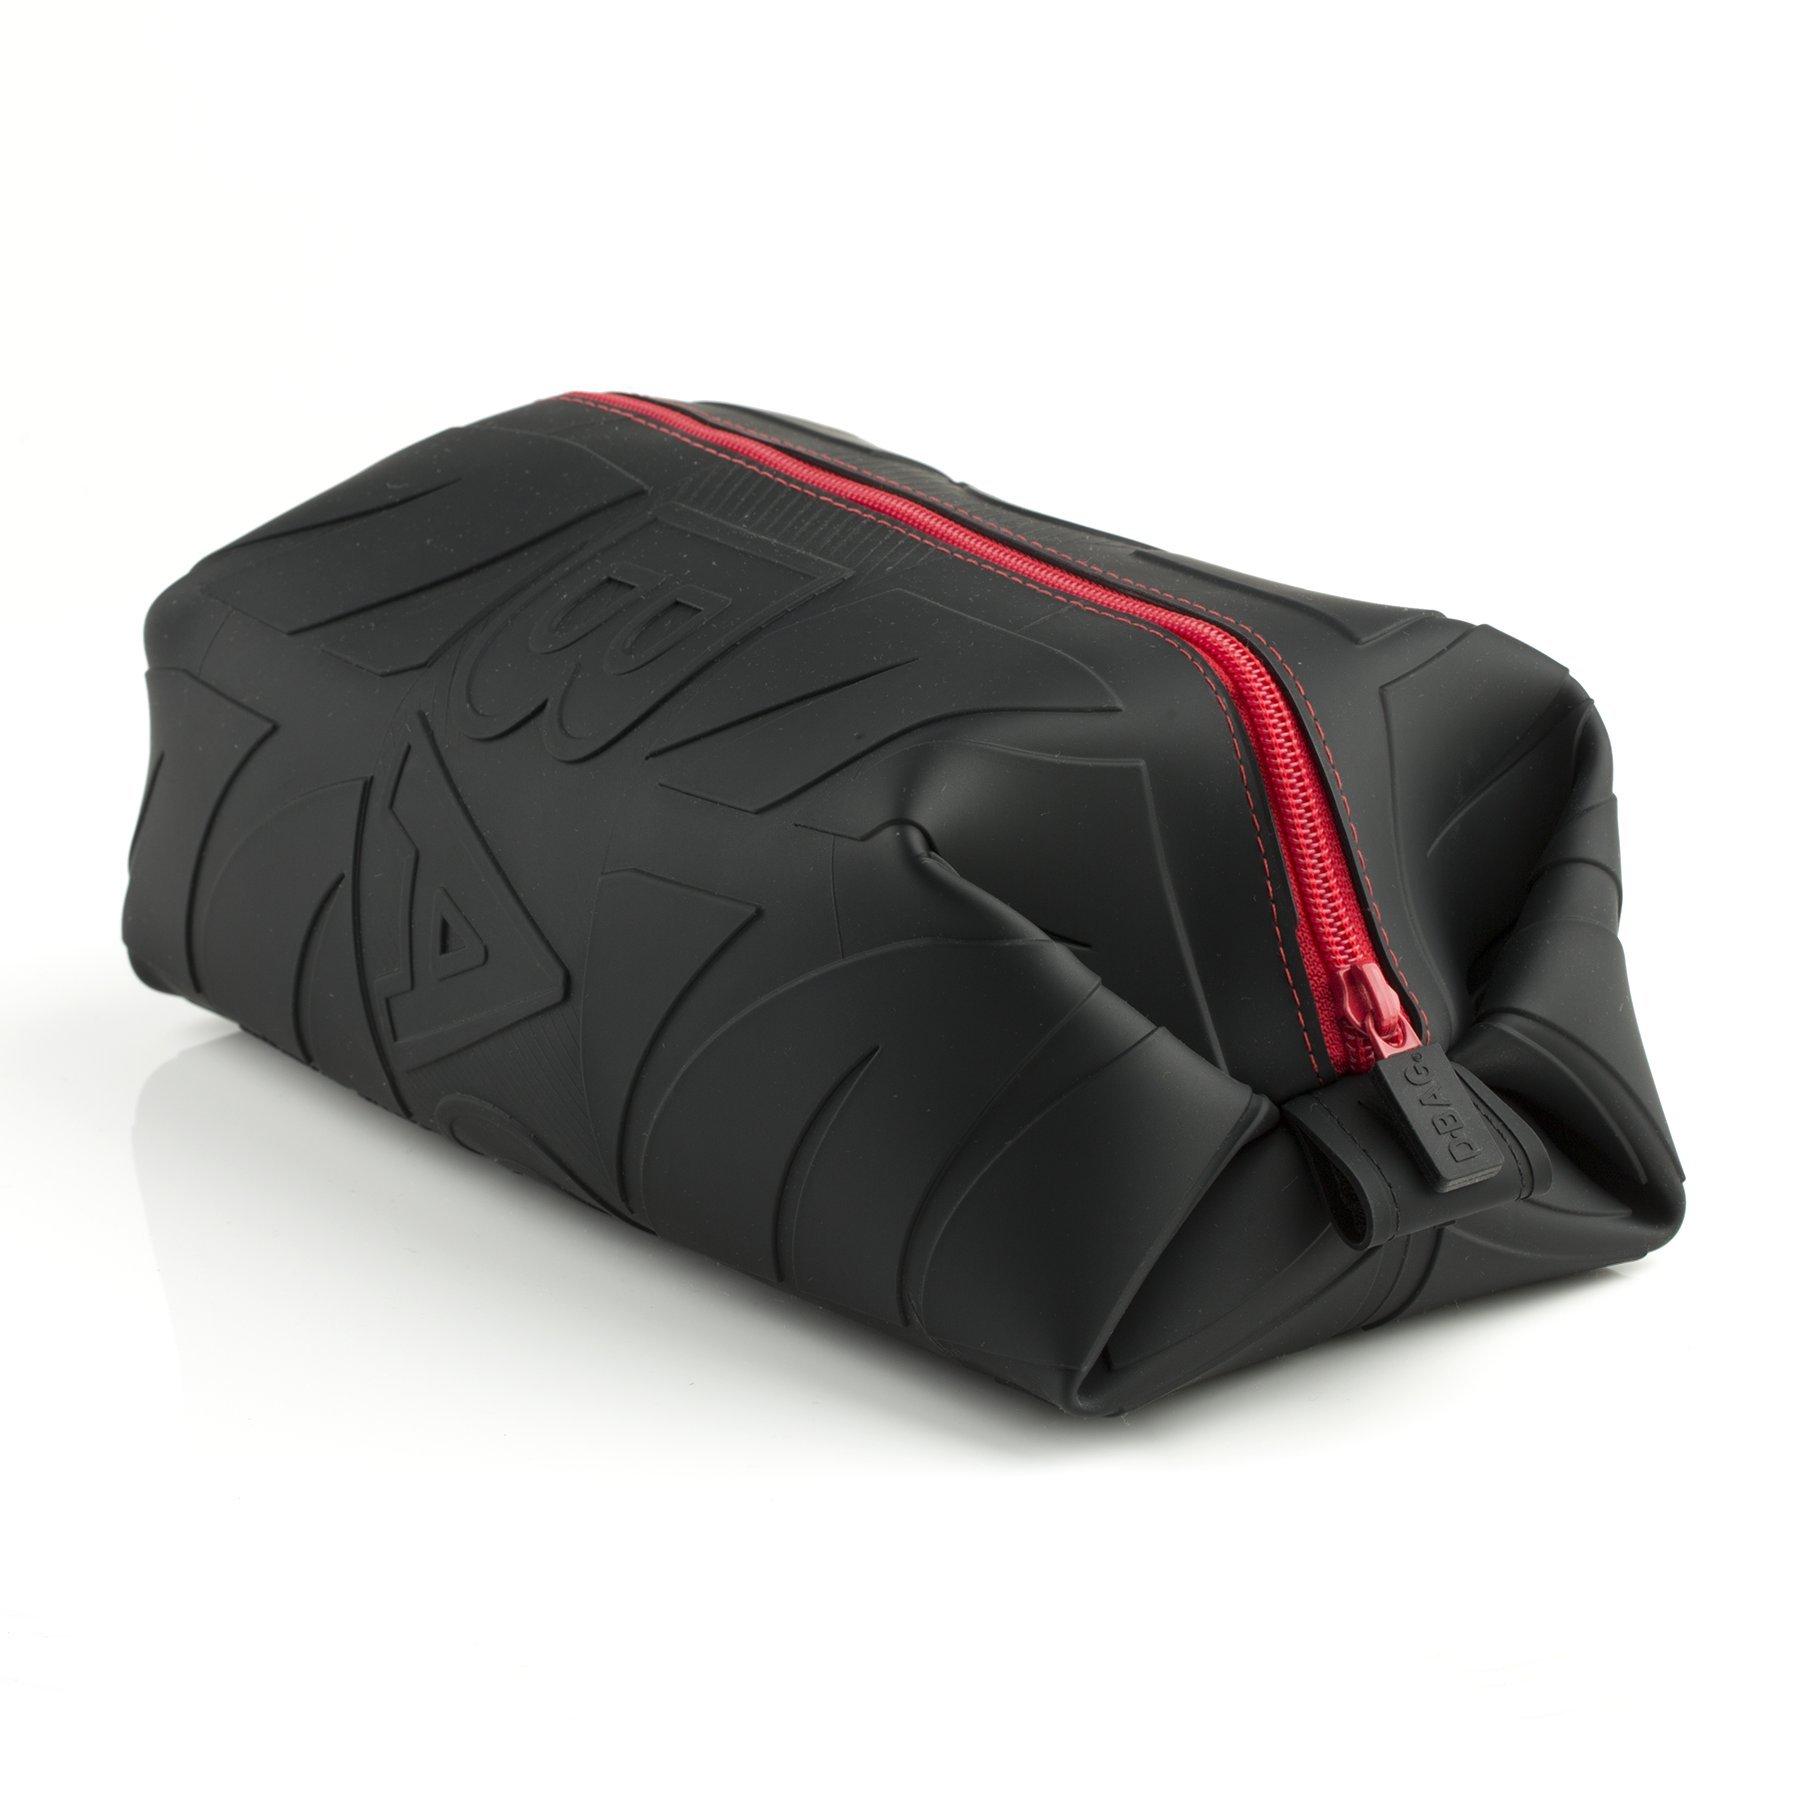 Wurkin Stiffs Leak Resistant Silicone Dopp Bag - Black TSA FRIENDLY by Wurkin Stiffs